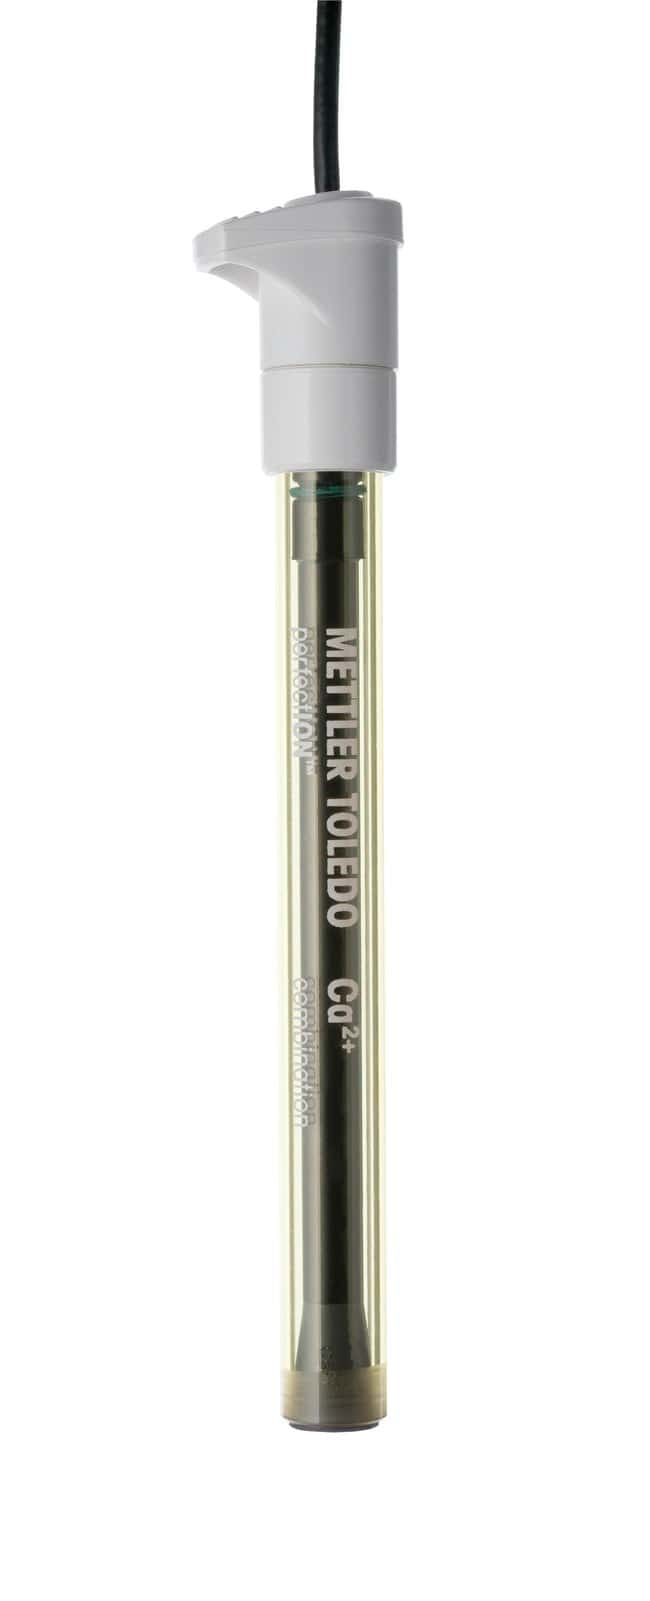 METTLER TOLEDO™Ion Selective Electrodes (ISE) Calcium Combination ISE; 0° to 40°C; BNC connector METTLER TOLEDO™Ion Selective Electrodes (ISE)